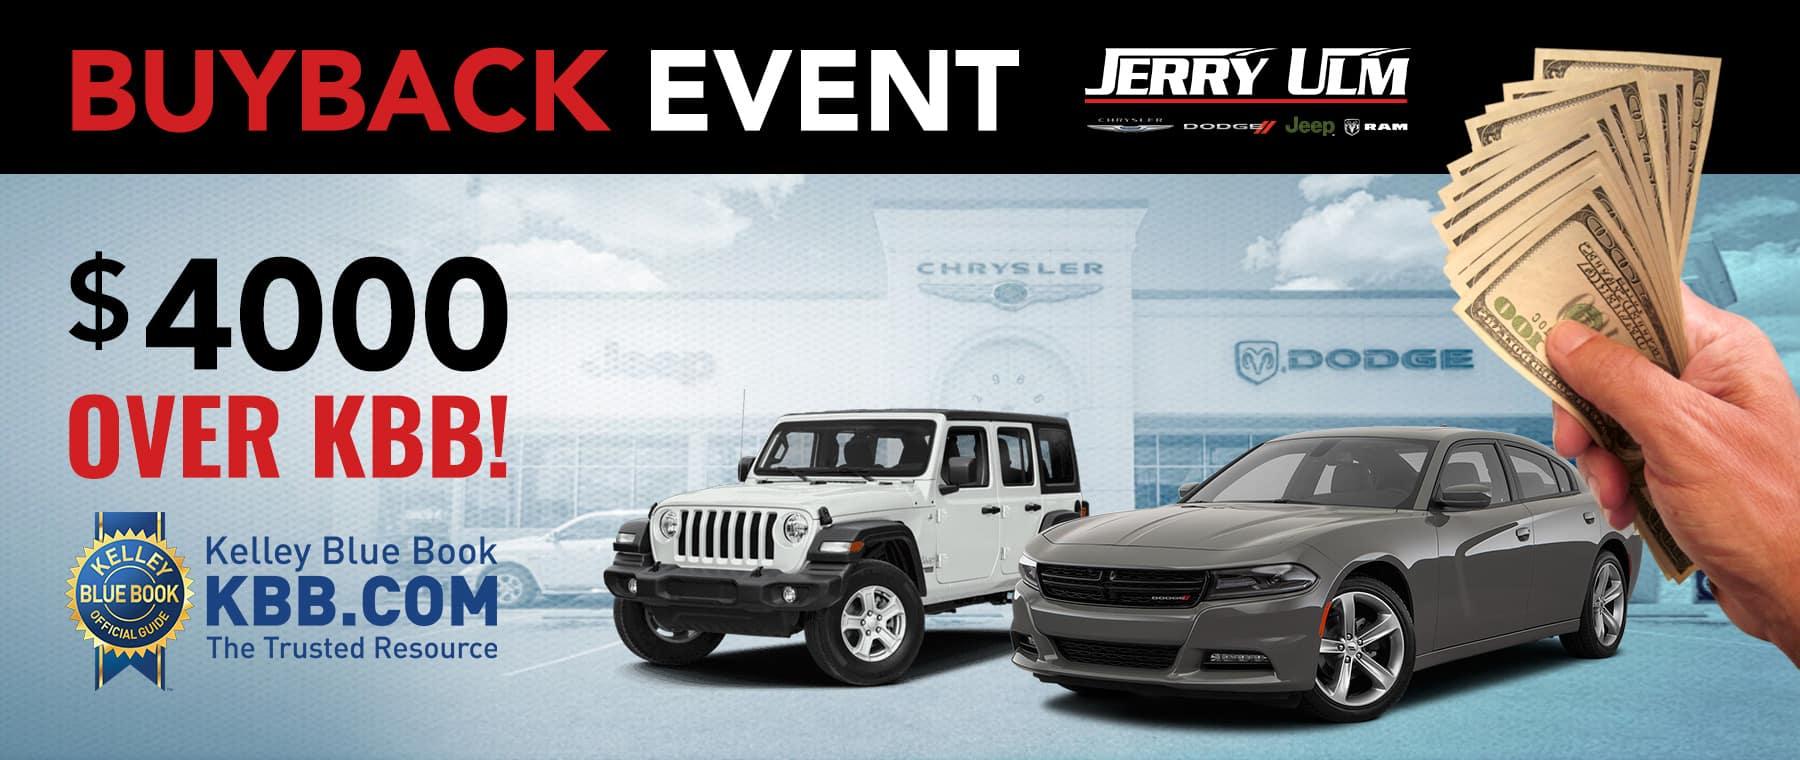 Kbb Com Cars Value >> Buyback Event Jerry Ulm Chrysler Dodge Jeep Ram Tampa